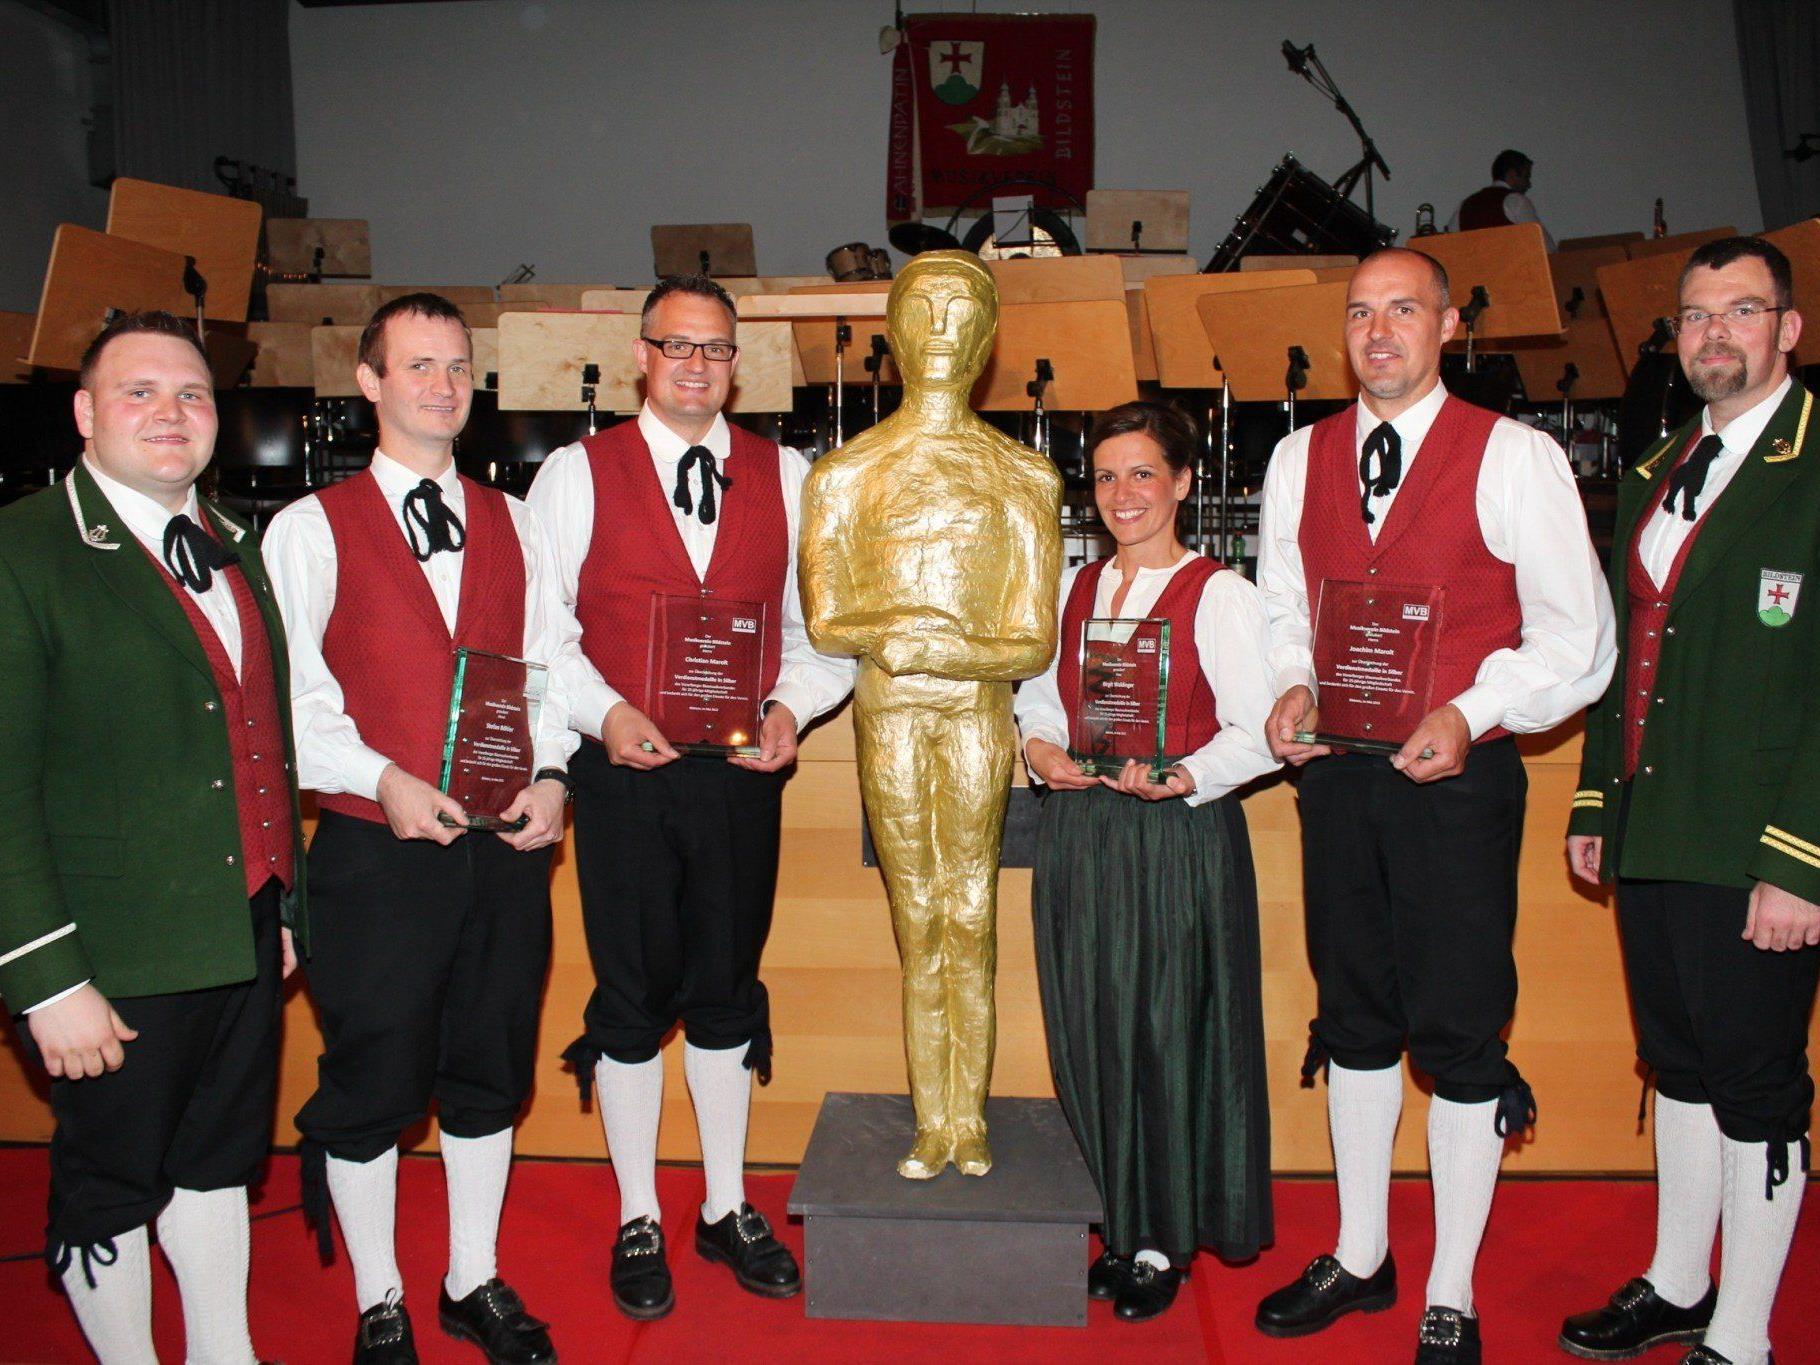 Michael Lenz, Stefan Böhler, Christian Marolt, Birgit Waldinger, Joachim Marolt, Klaus Greiderer